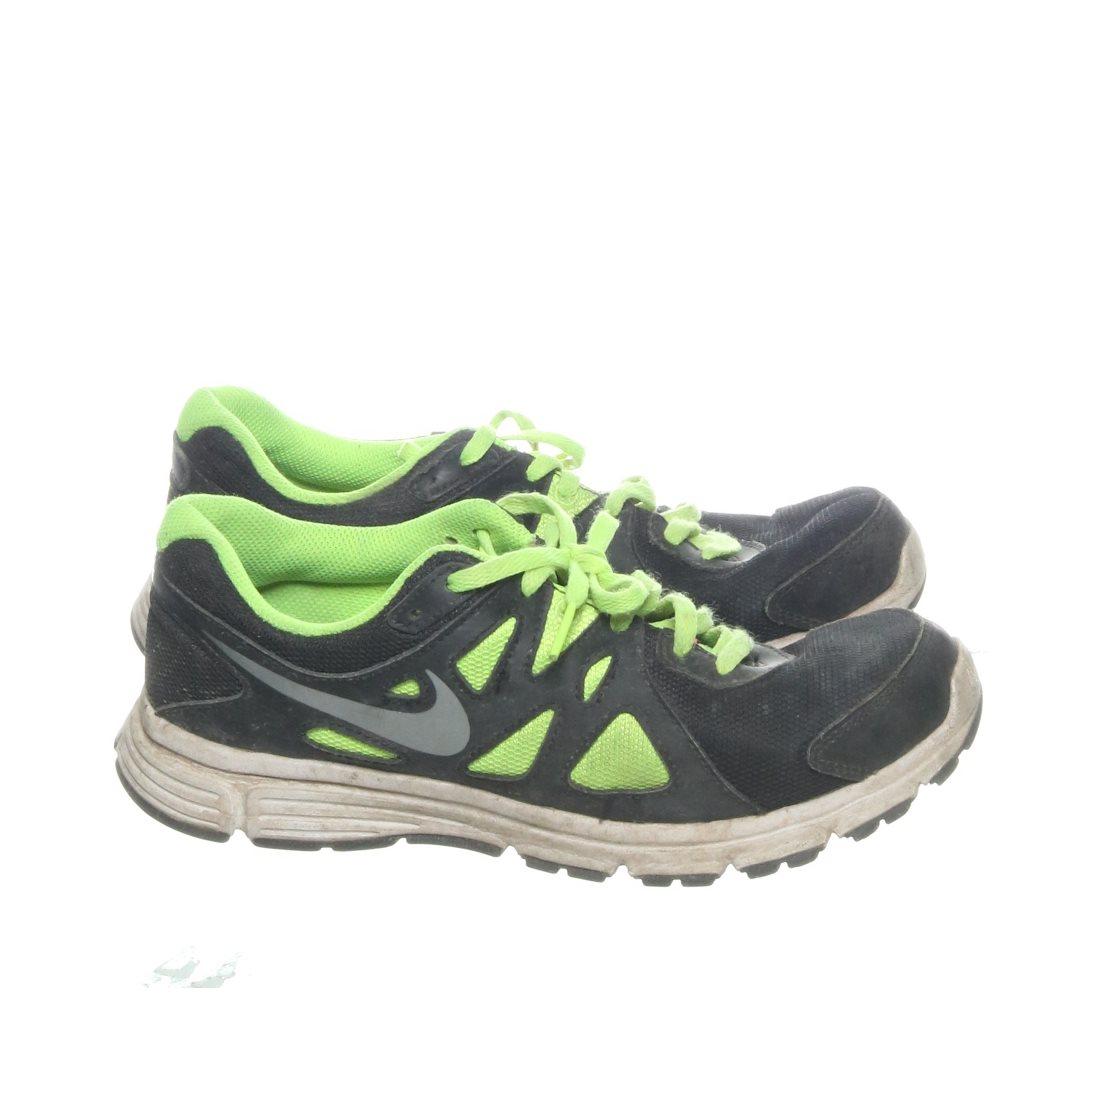 online store ecfb7 f9fe7 ... official nike sneakers strl 375 svart gul d6c78 1de4f